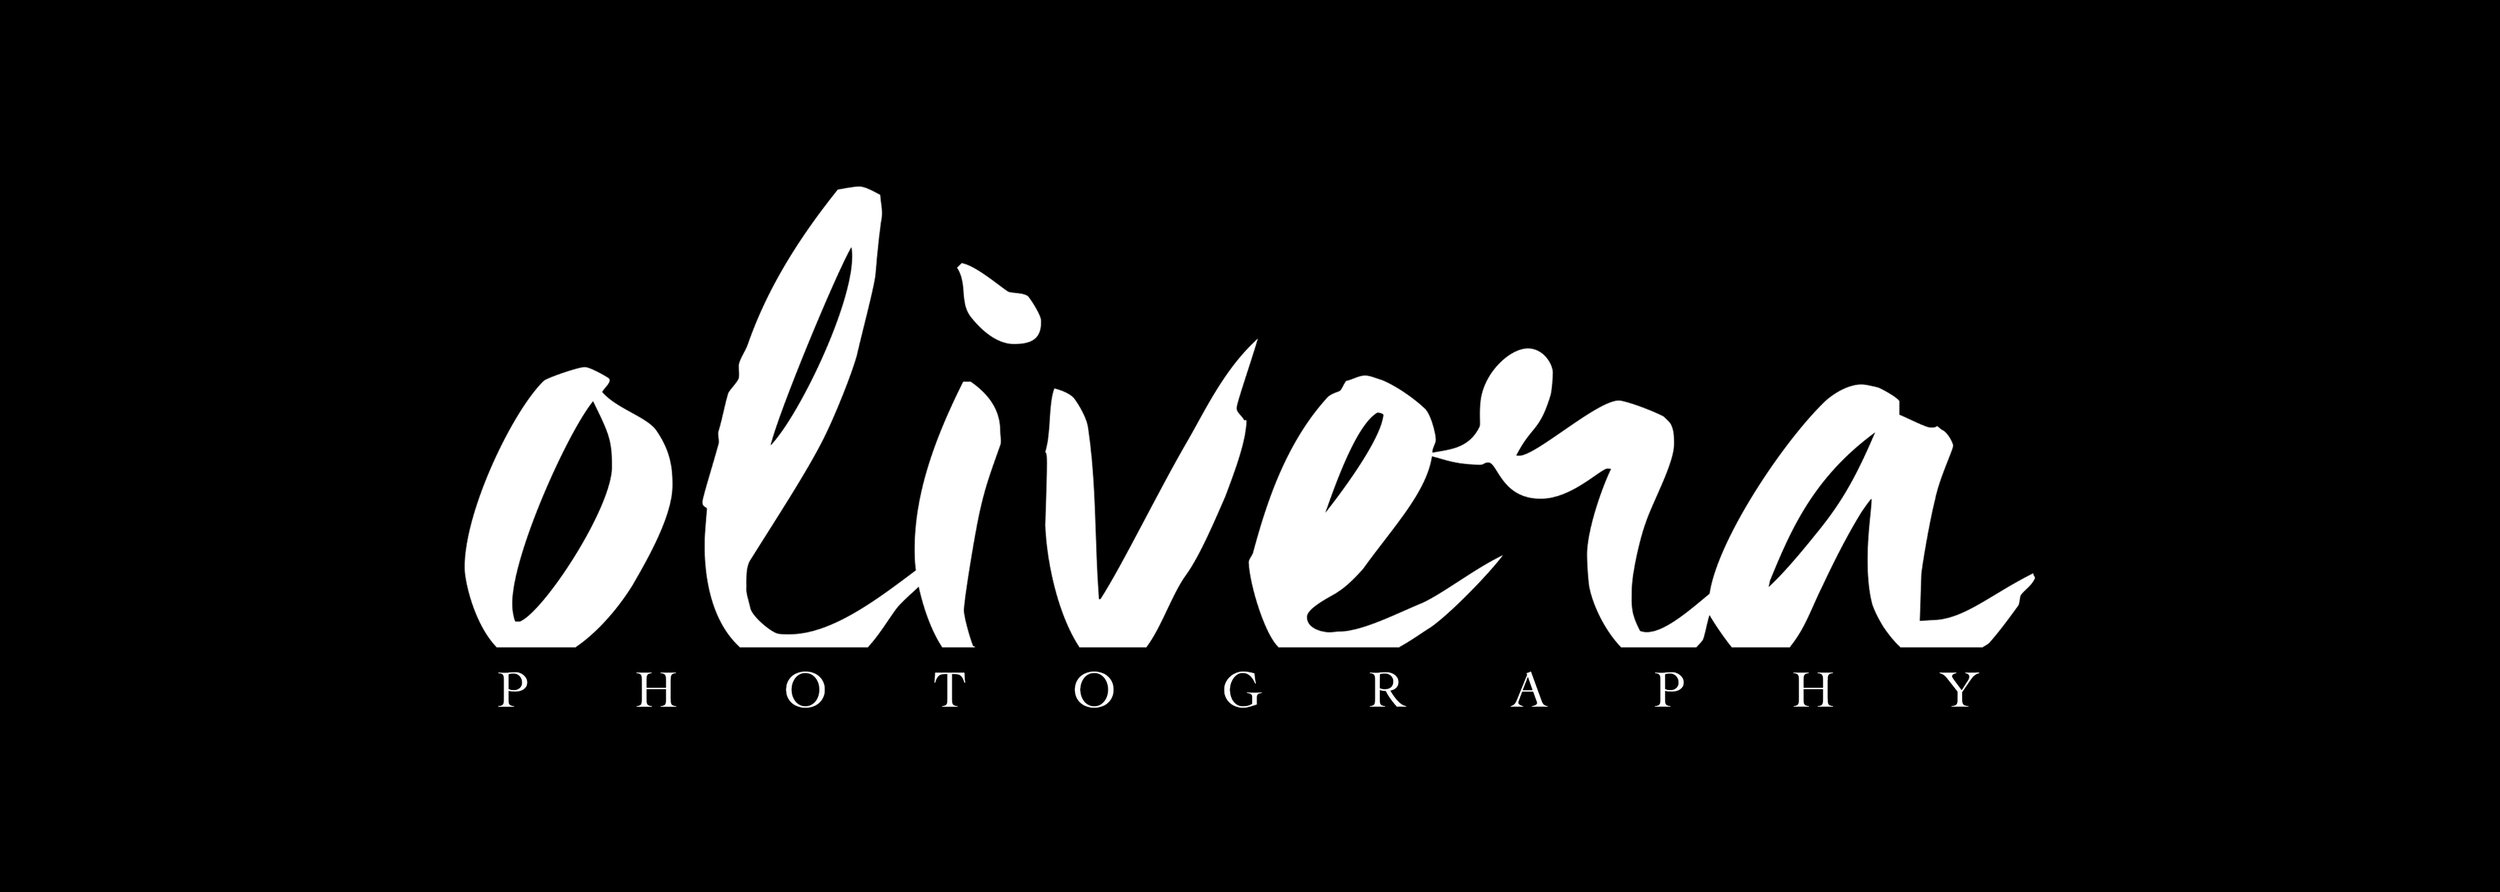 OLIVERA.jpg